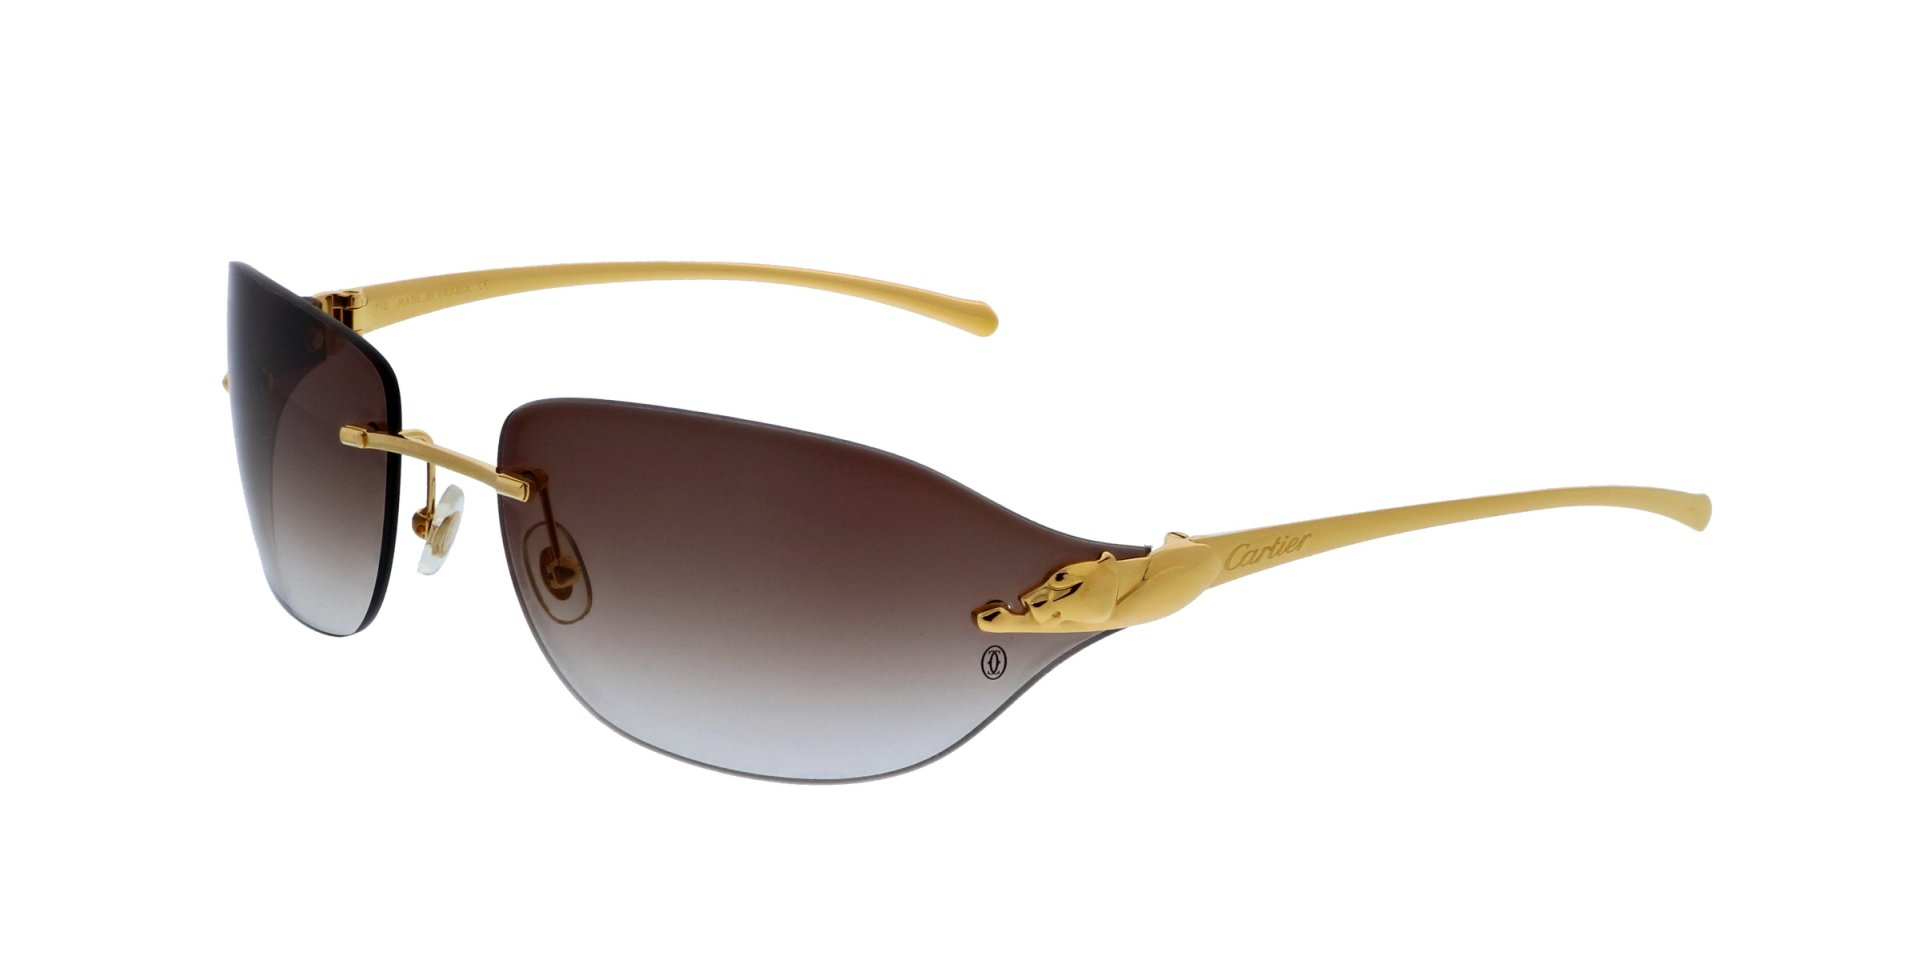 5a100ded357 Sunglasses Cartier ✓ Sunglasses Galleries